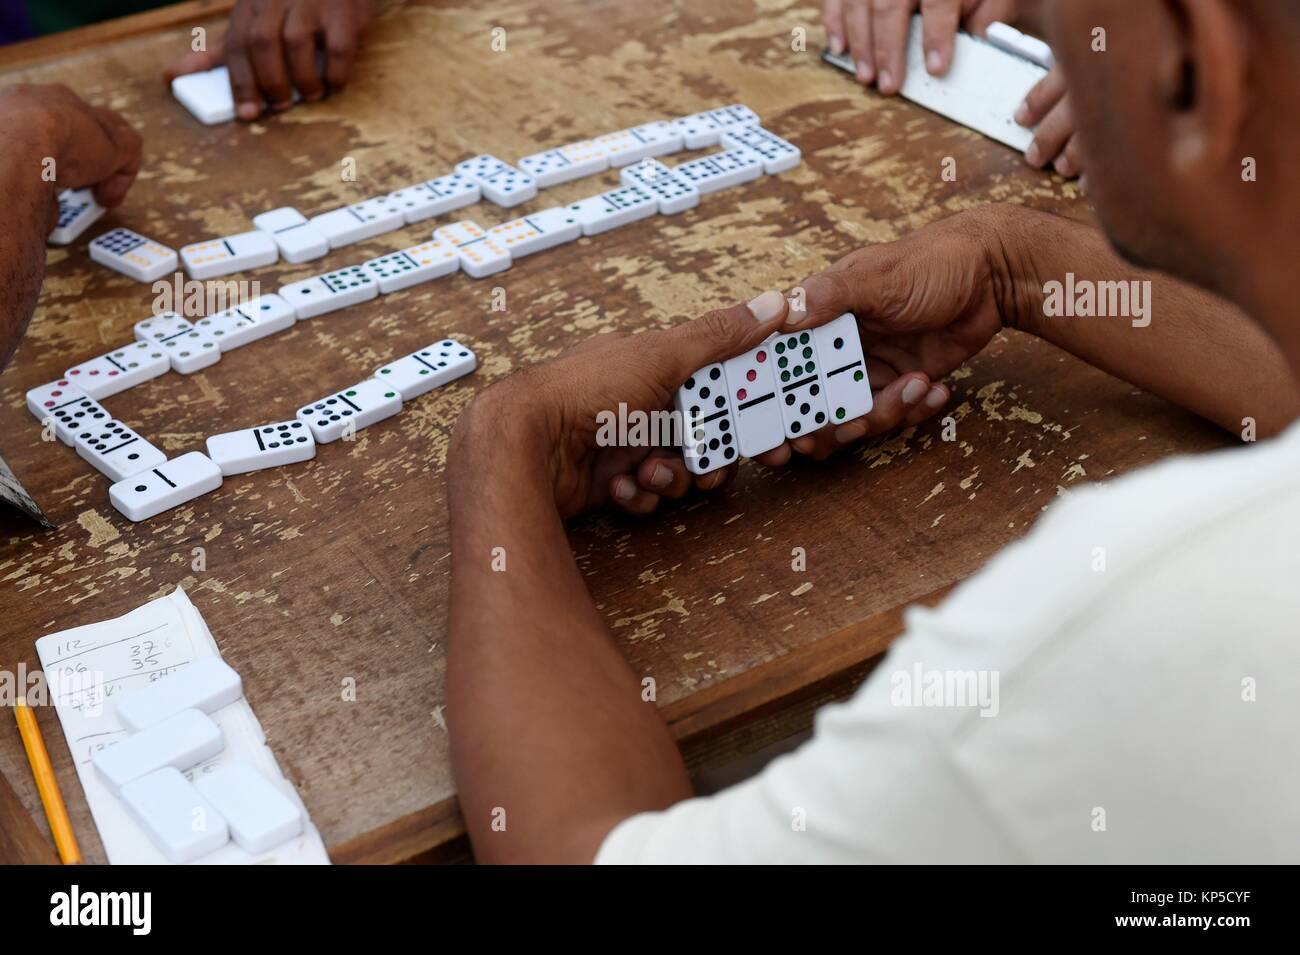 Domino players, Havana, Cuba. - Stock Image